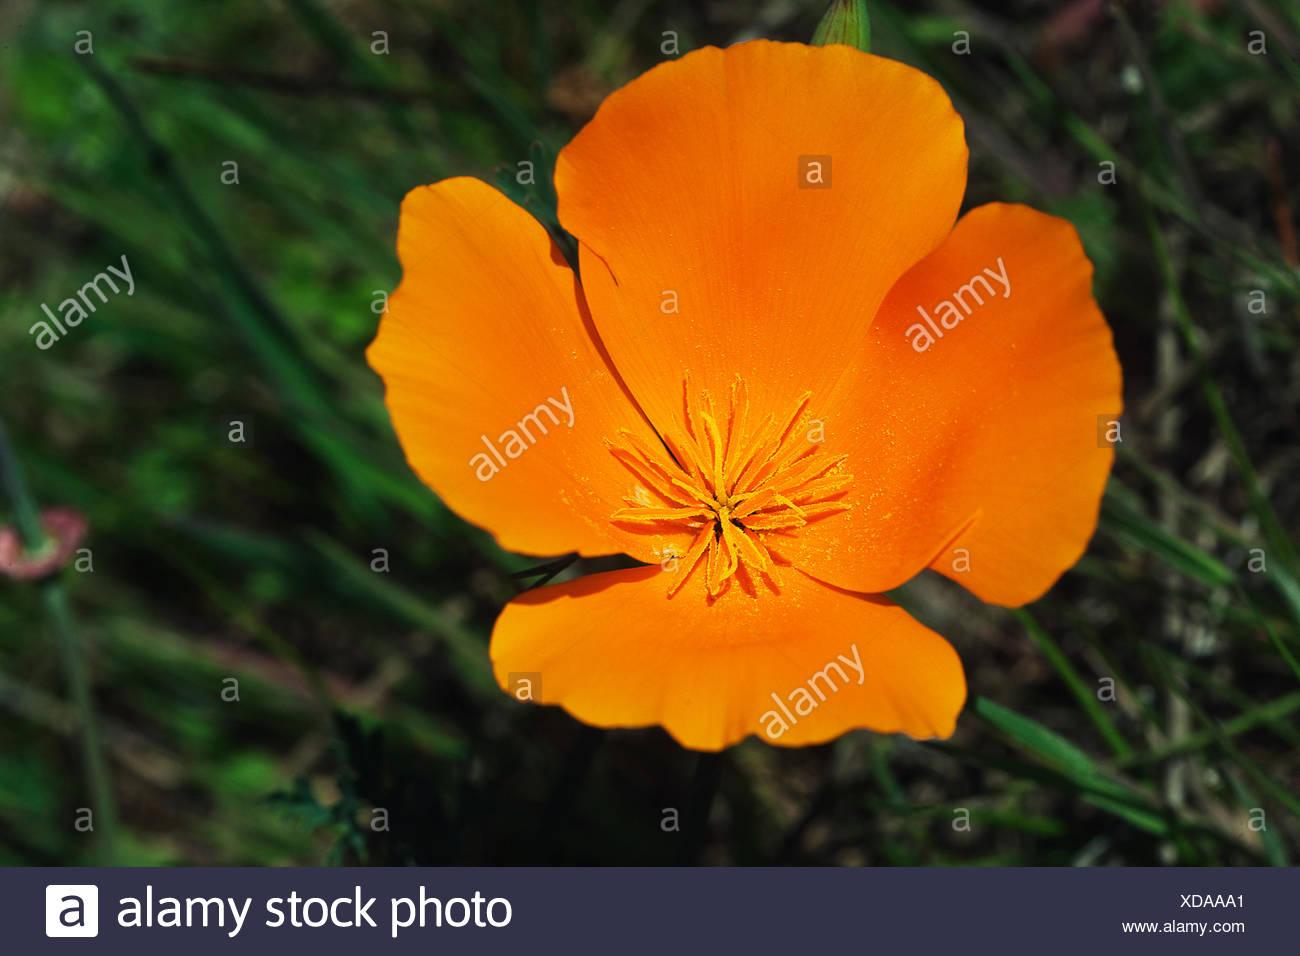 Golden poppy the official state flower of california stock photo golden poppy the official state flower of california mightylinksfo